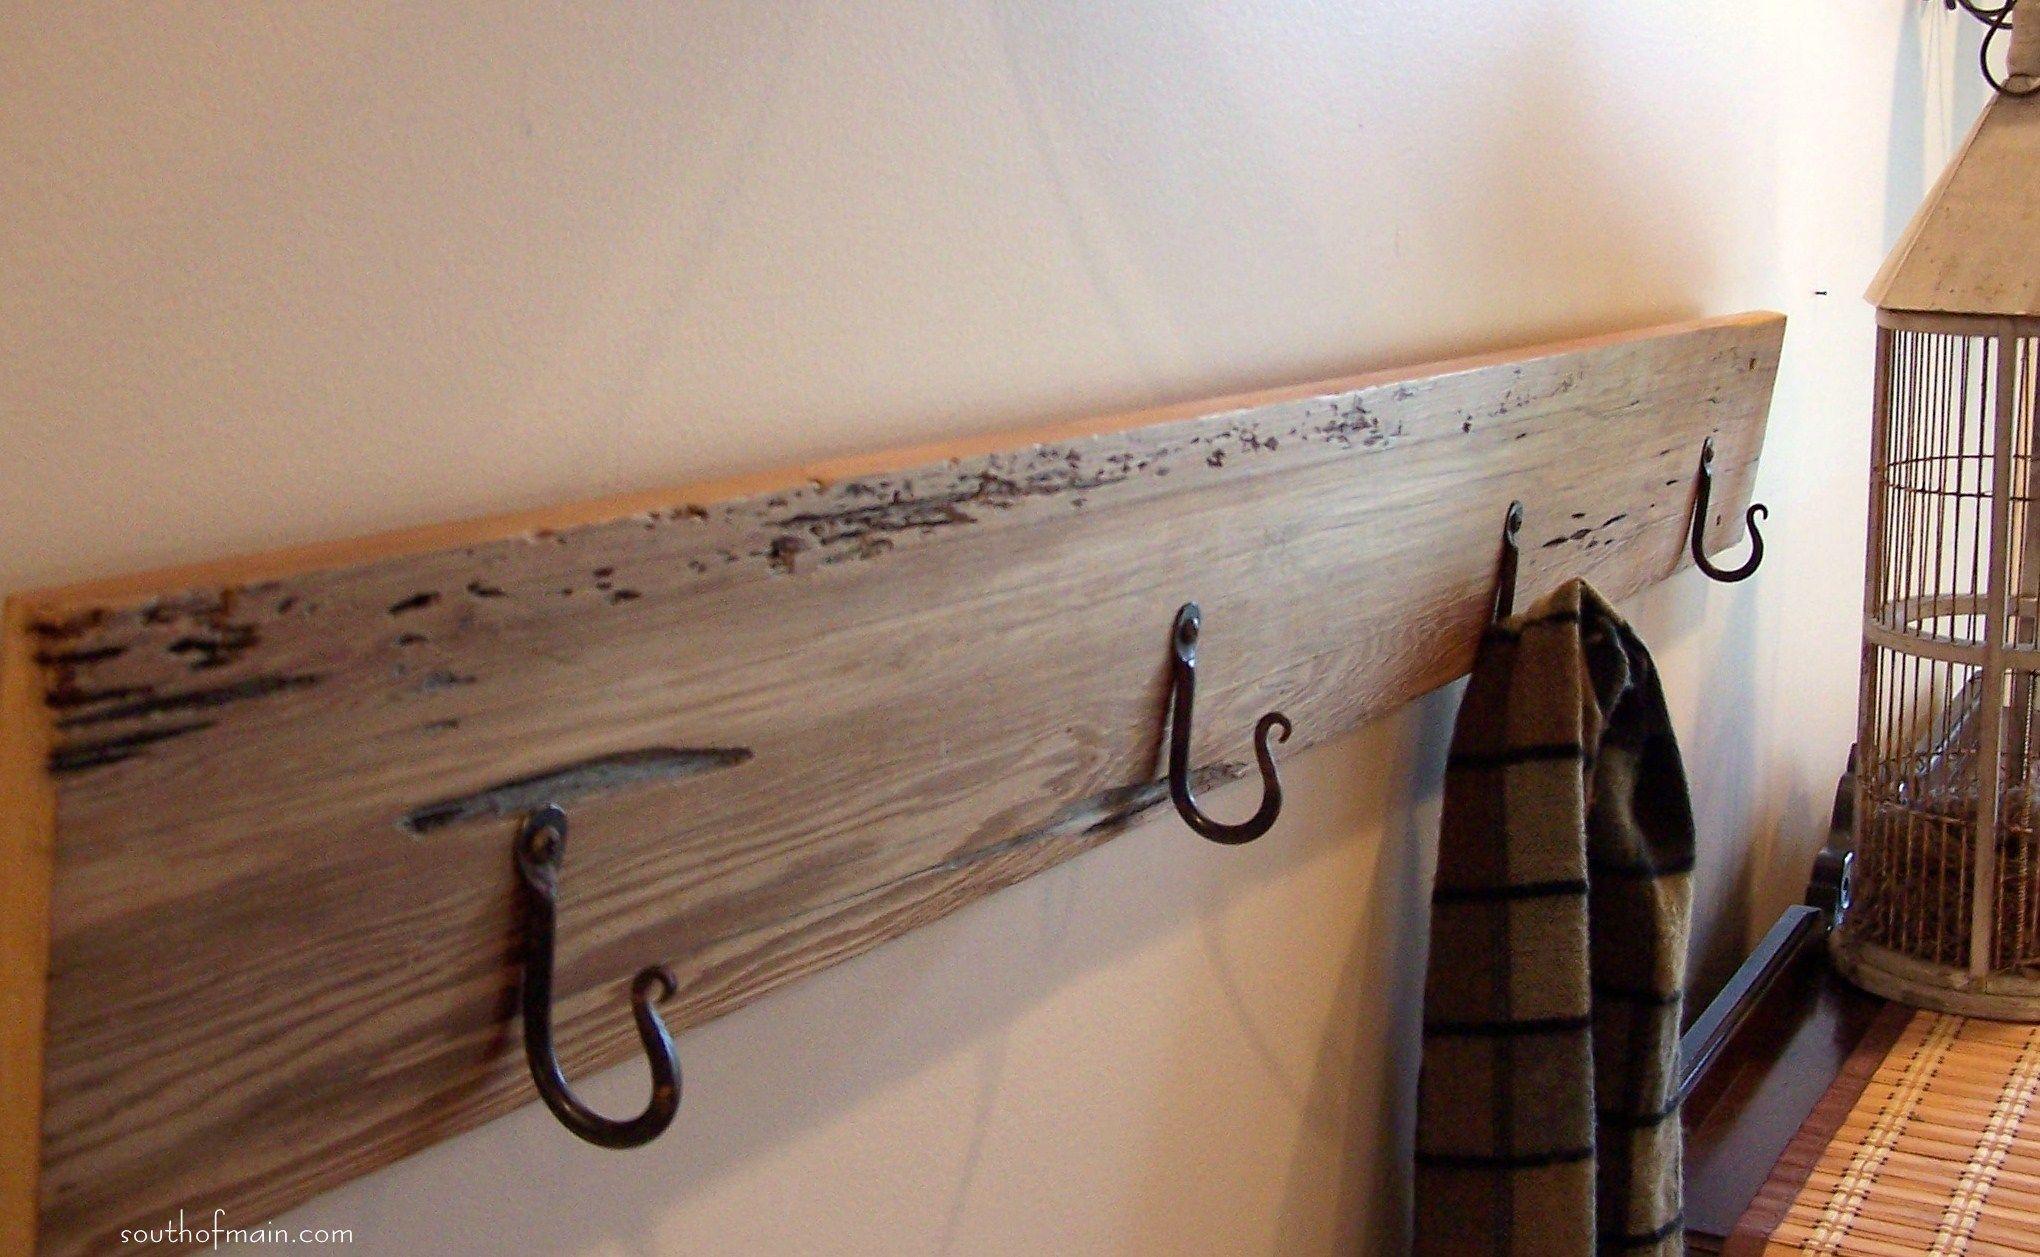 Featured Furniture Stunning Diy Wall Mounted Coat Rack With Black Rustic Coat Hook Design On Woo Coat Rack Wall Wall Mounted Coat Hanger Wall Mounted Coat Rack